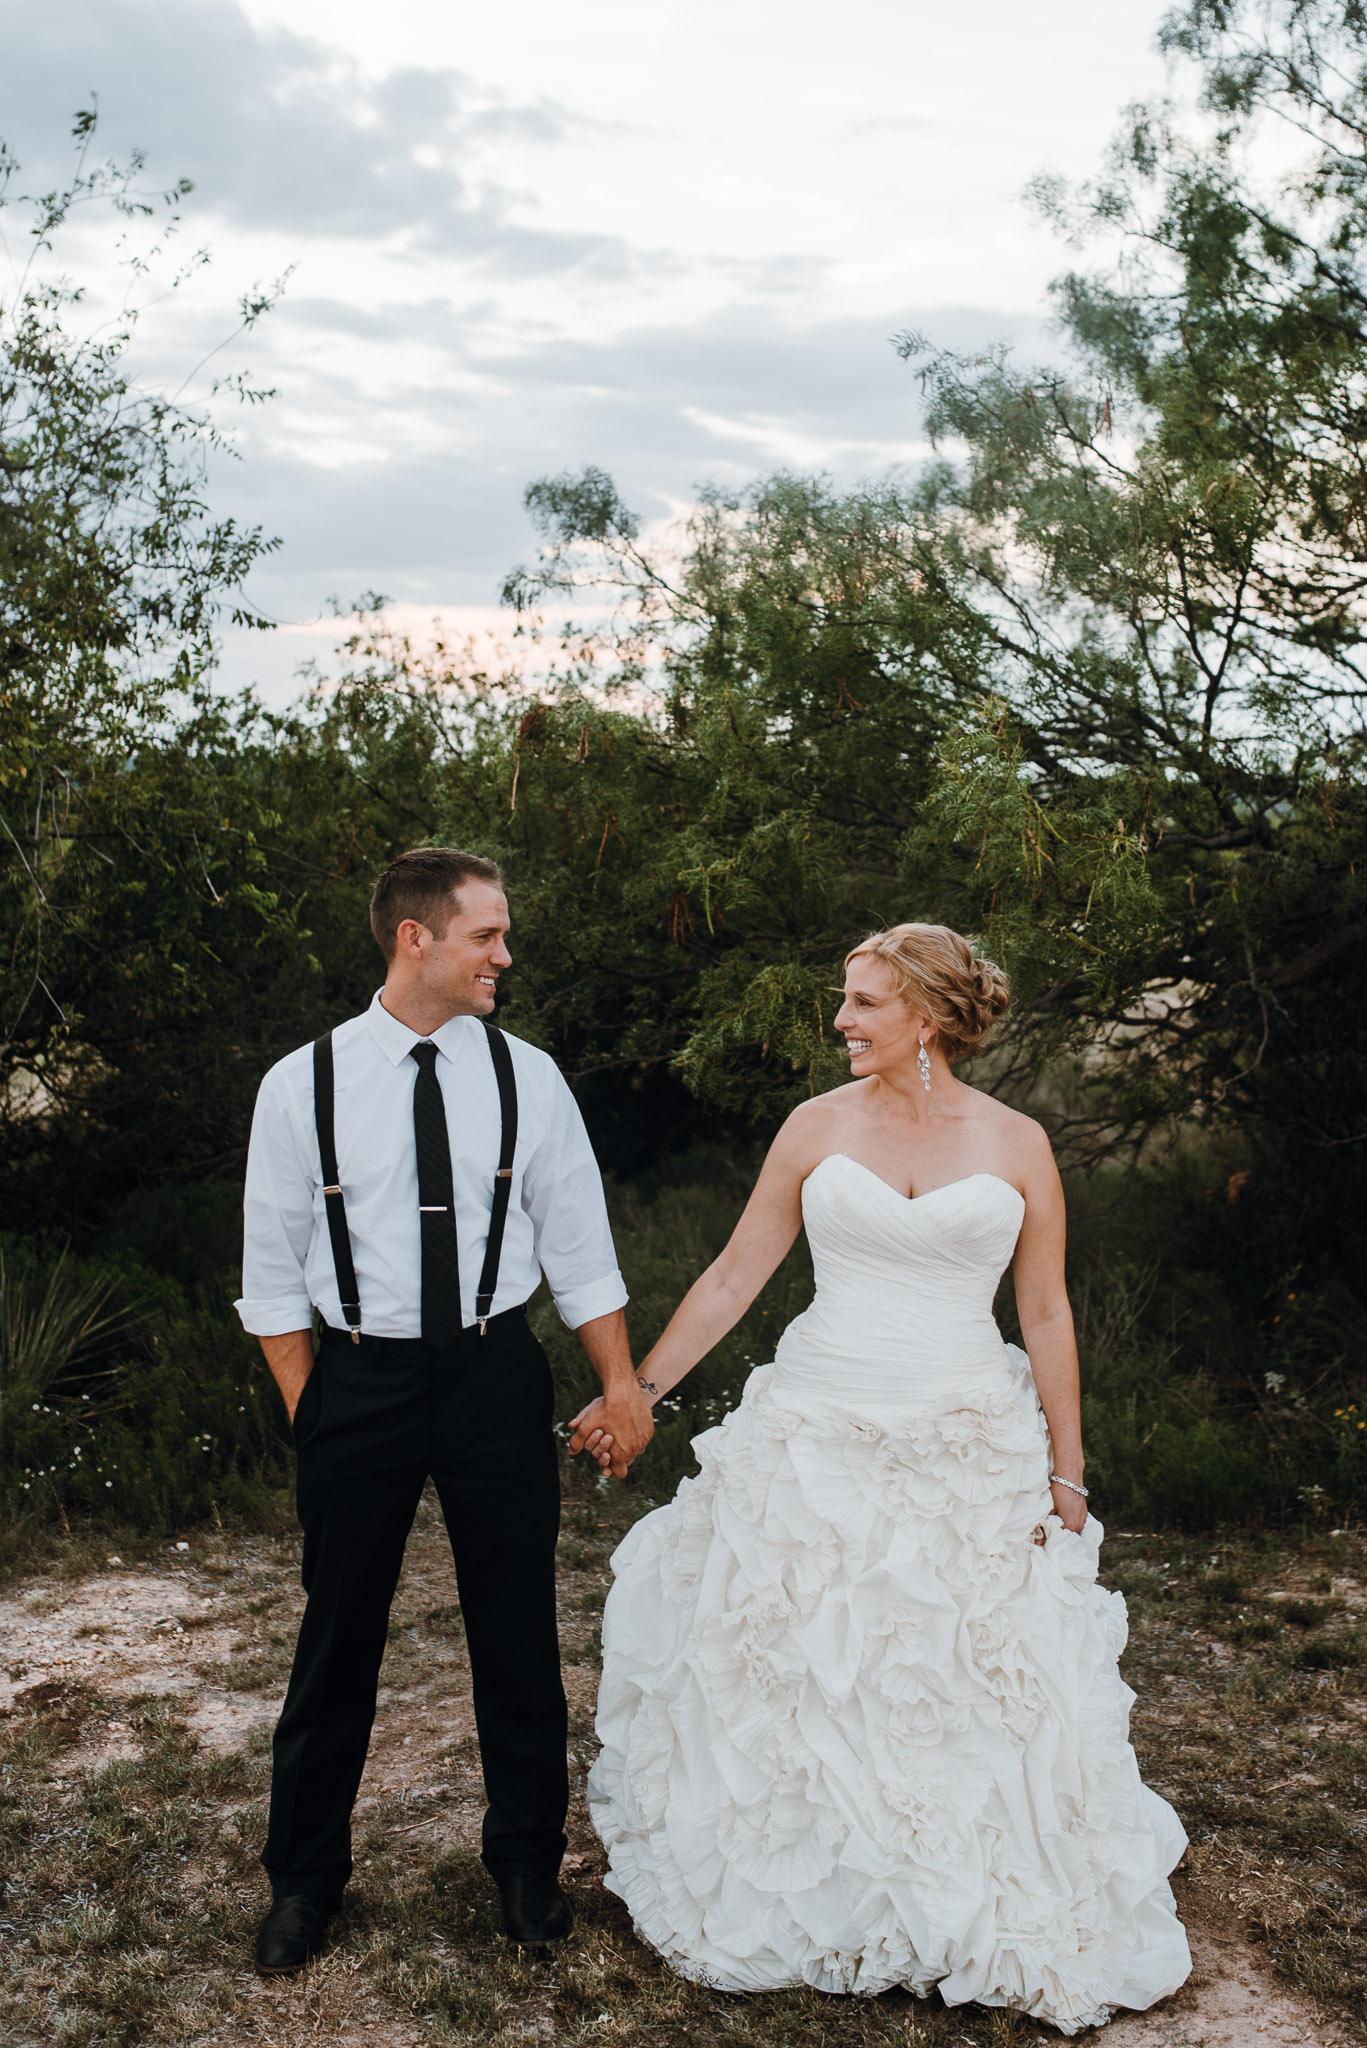 Rowena-West-Texas-Wedding-Photographer-Gillian&Ryan-0052.jpg